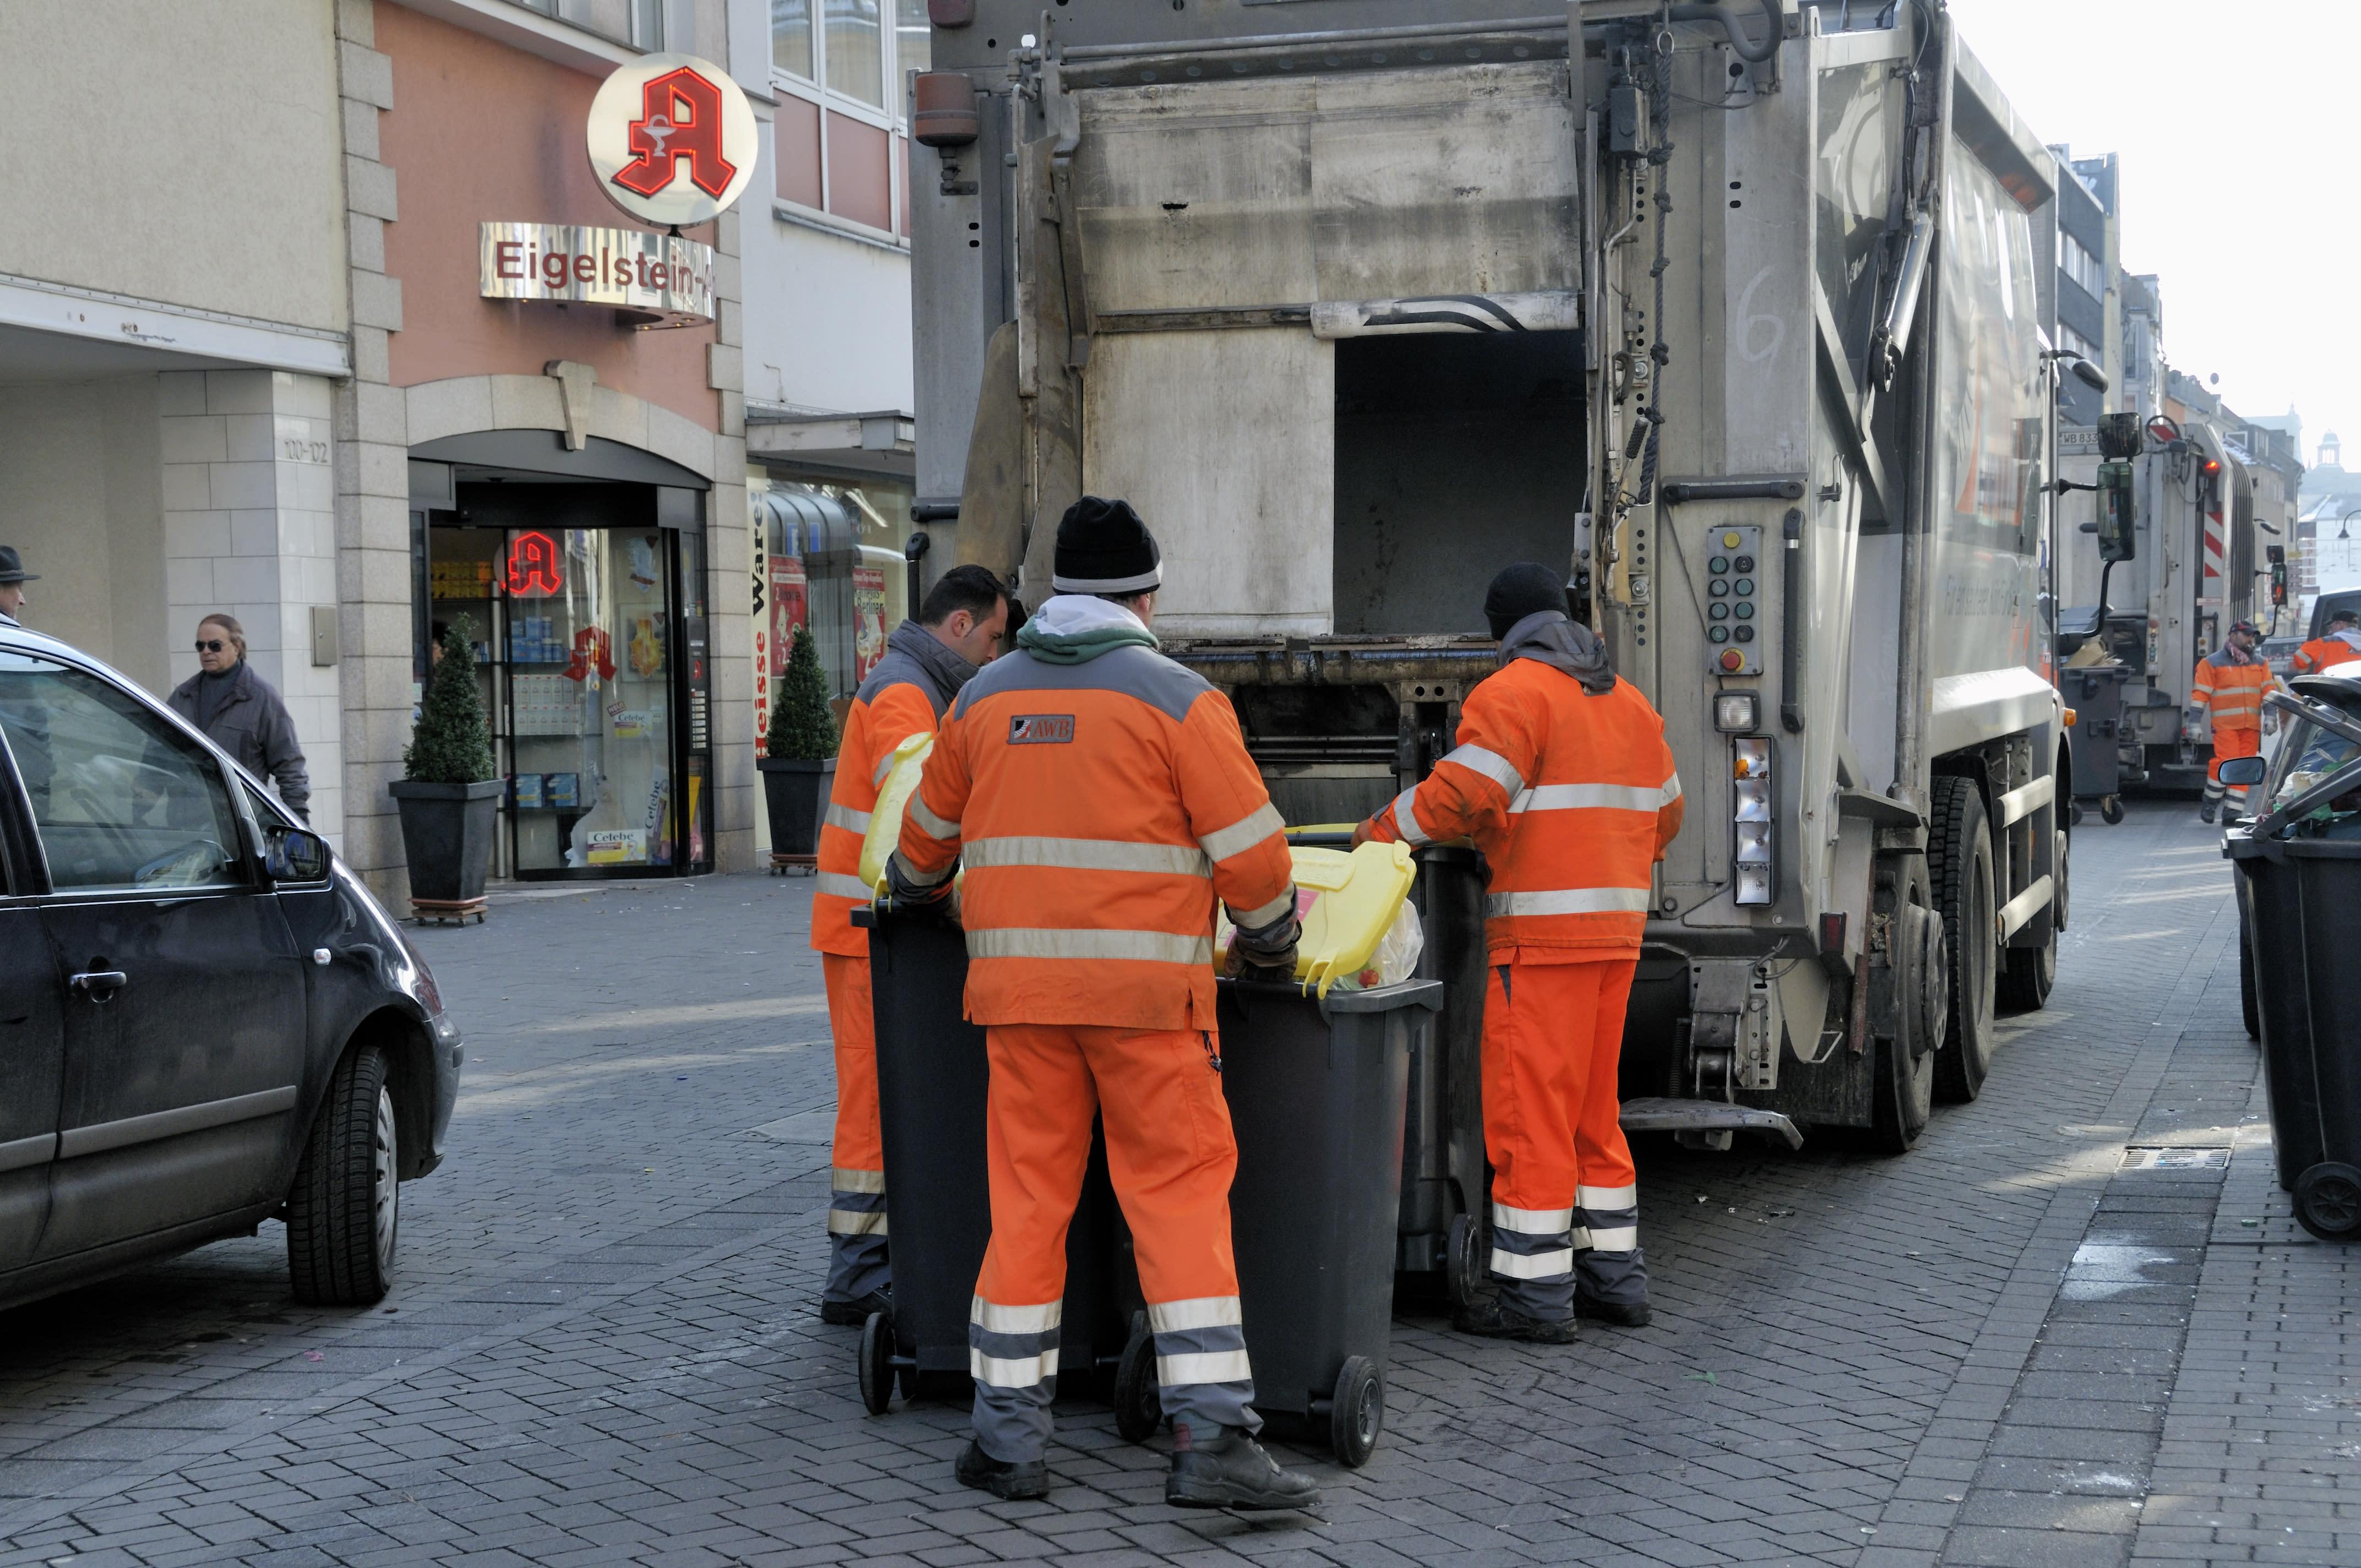 Beruf Müllmann: Anstrengend, stinkig - aber gut bezahlt?